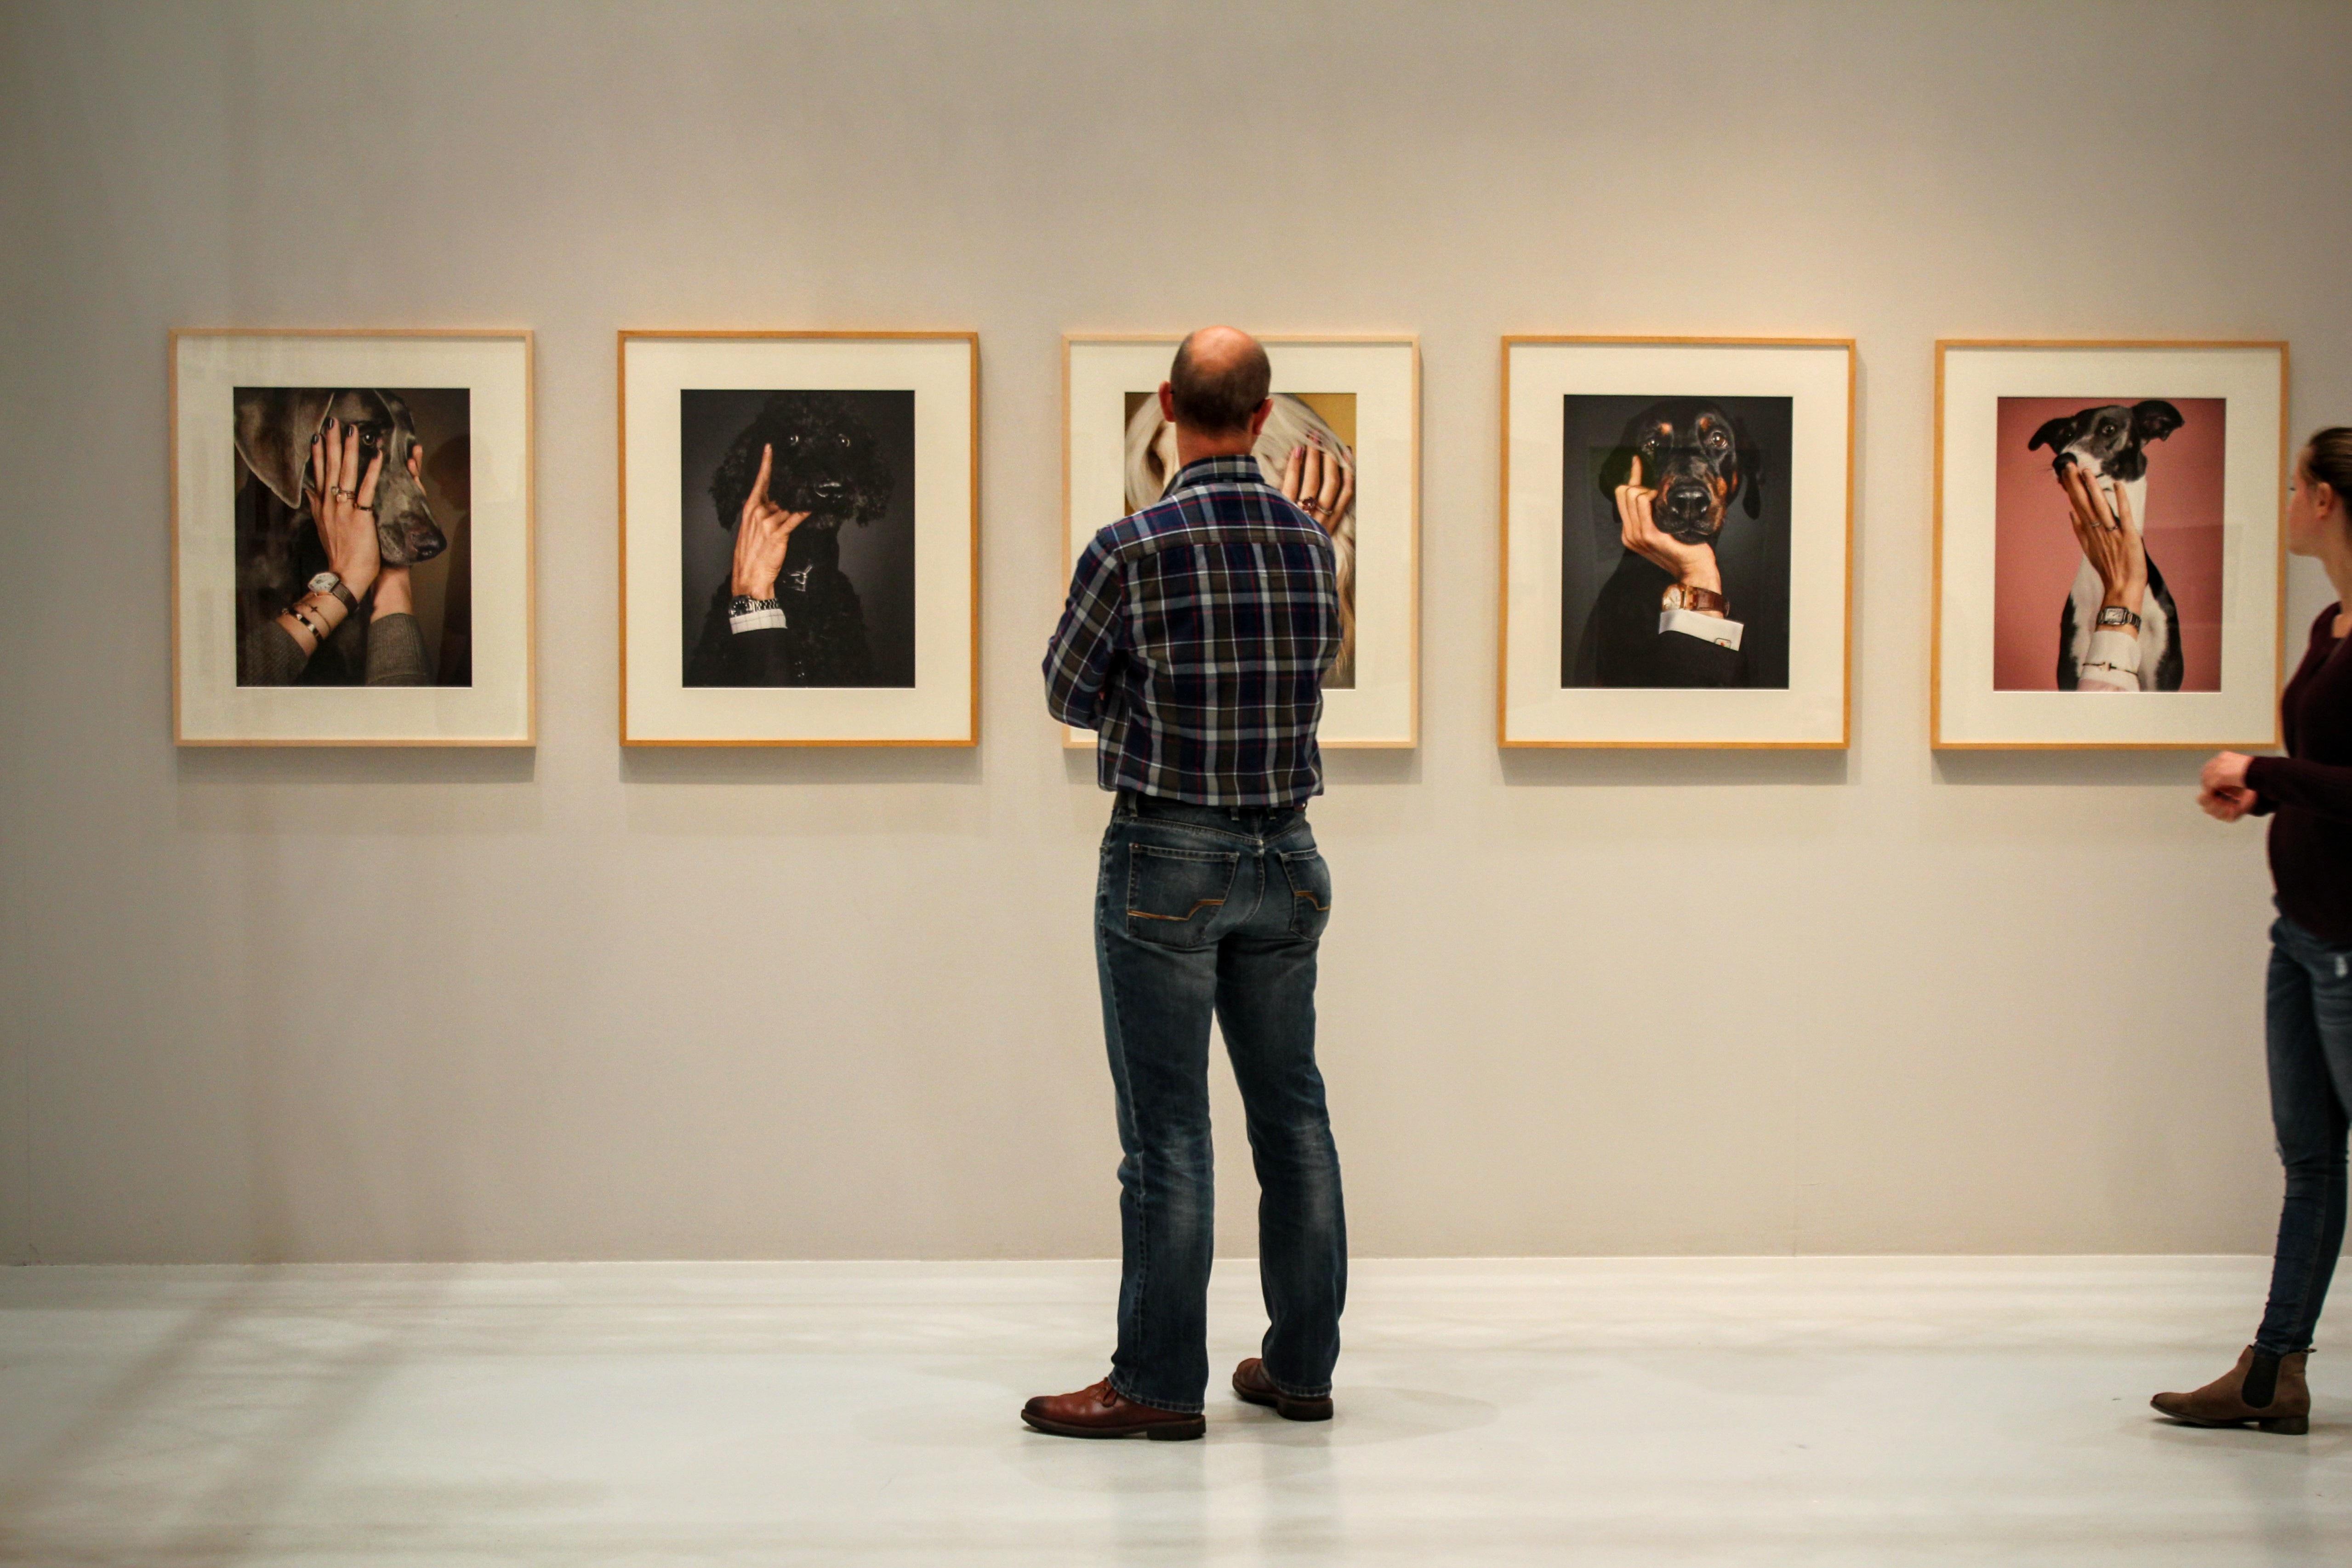 D Art Exhibition Jbr : 무료 이미지 박물관 디자인 갱도 만나다 관광 명소 방문자 현대 미술 미술관 전시회